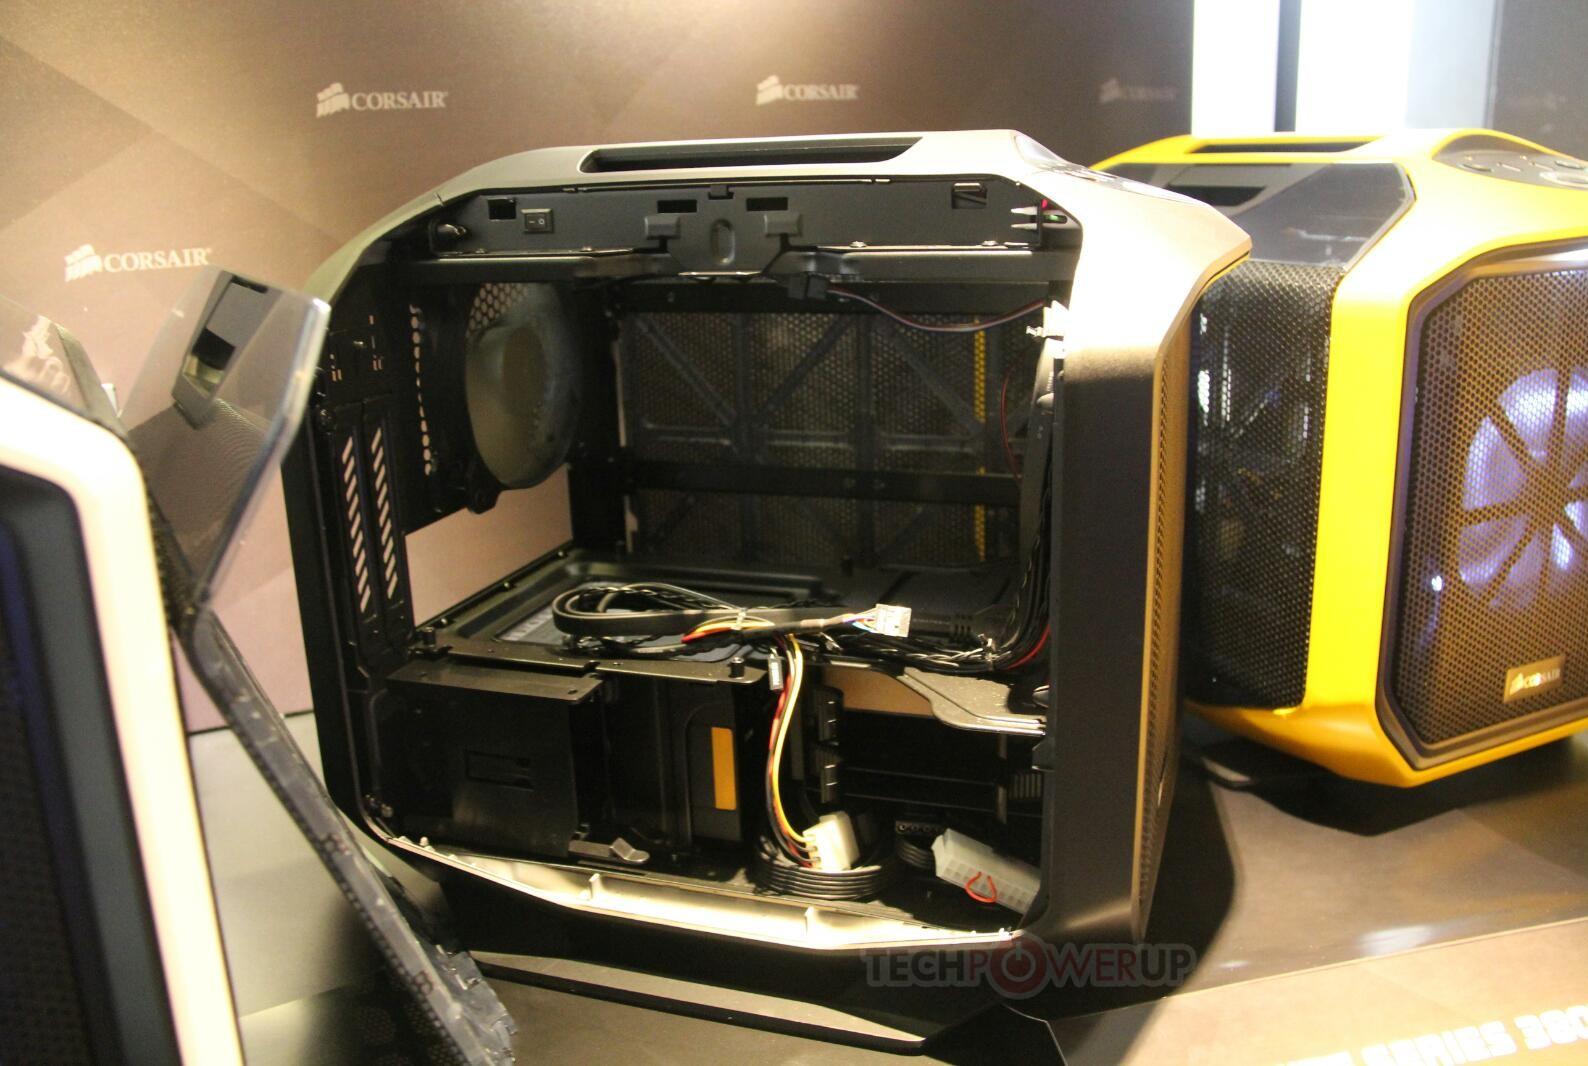 Corsair Shows Off Colorful Graphite 380t Mini Itx Cases